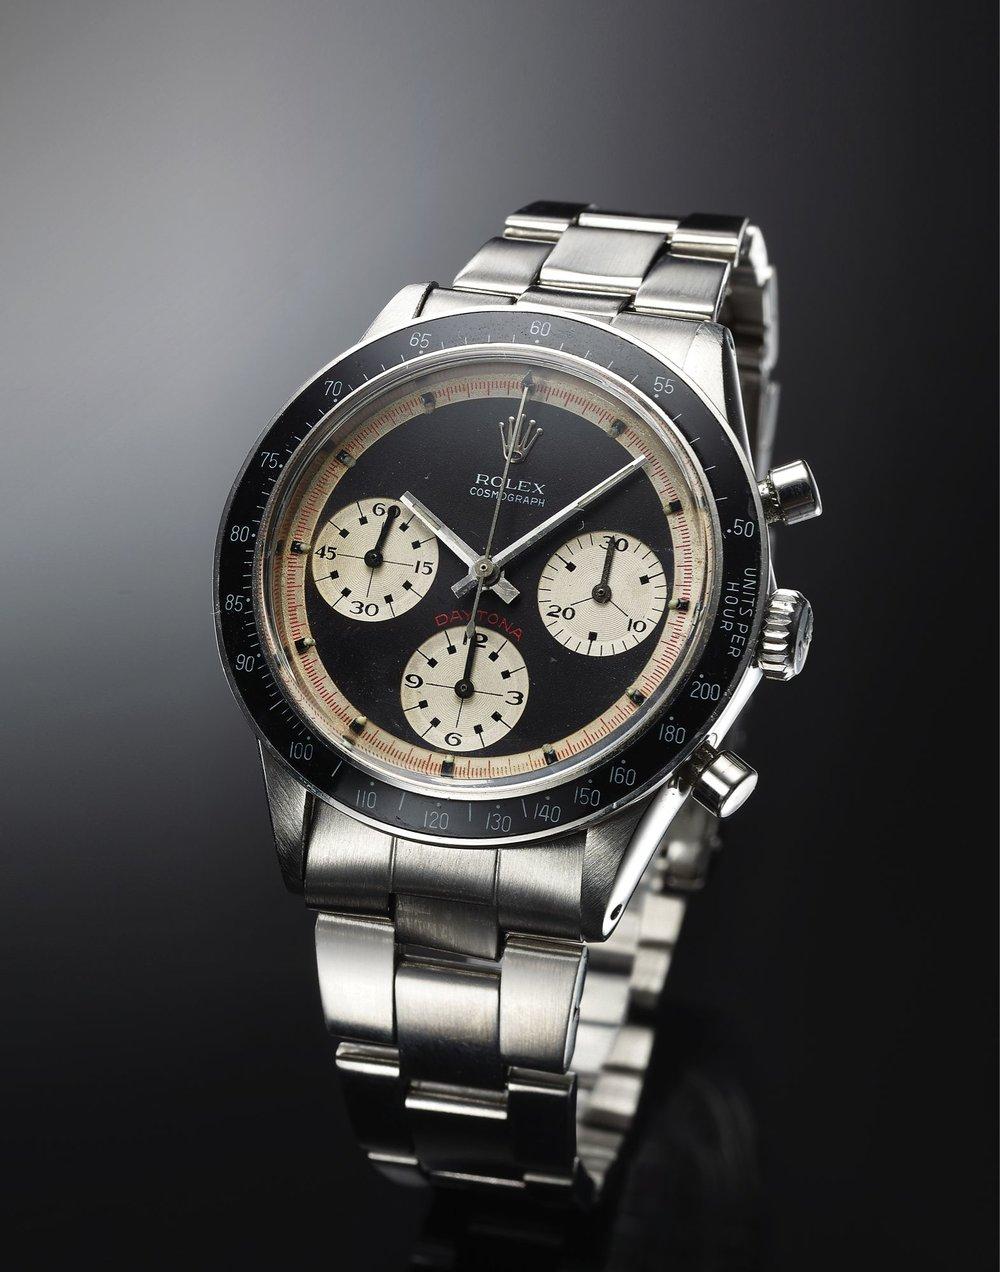 Rolex Daytona Ref 6241 Ellen